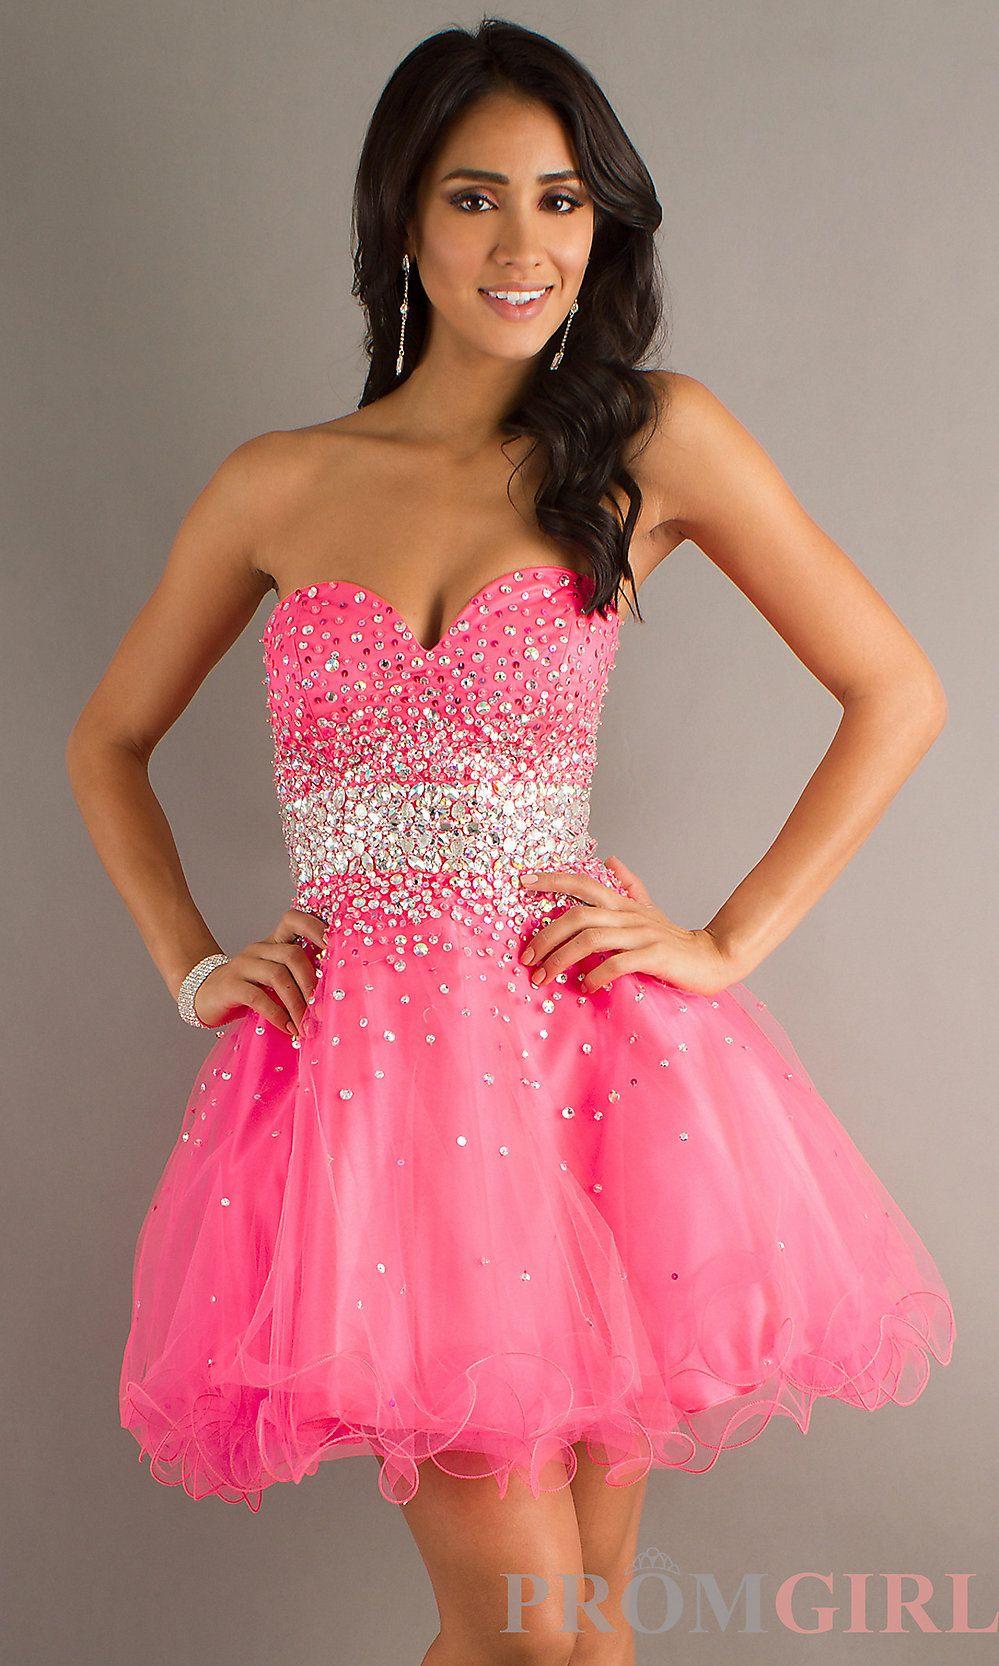 Strapless Beaded Party Dress, Mori Lee Short Prom Dress- PromGirl ...